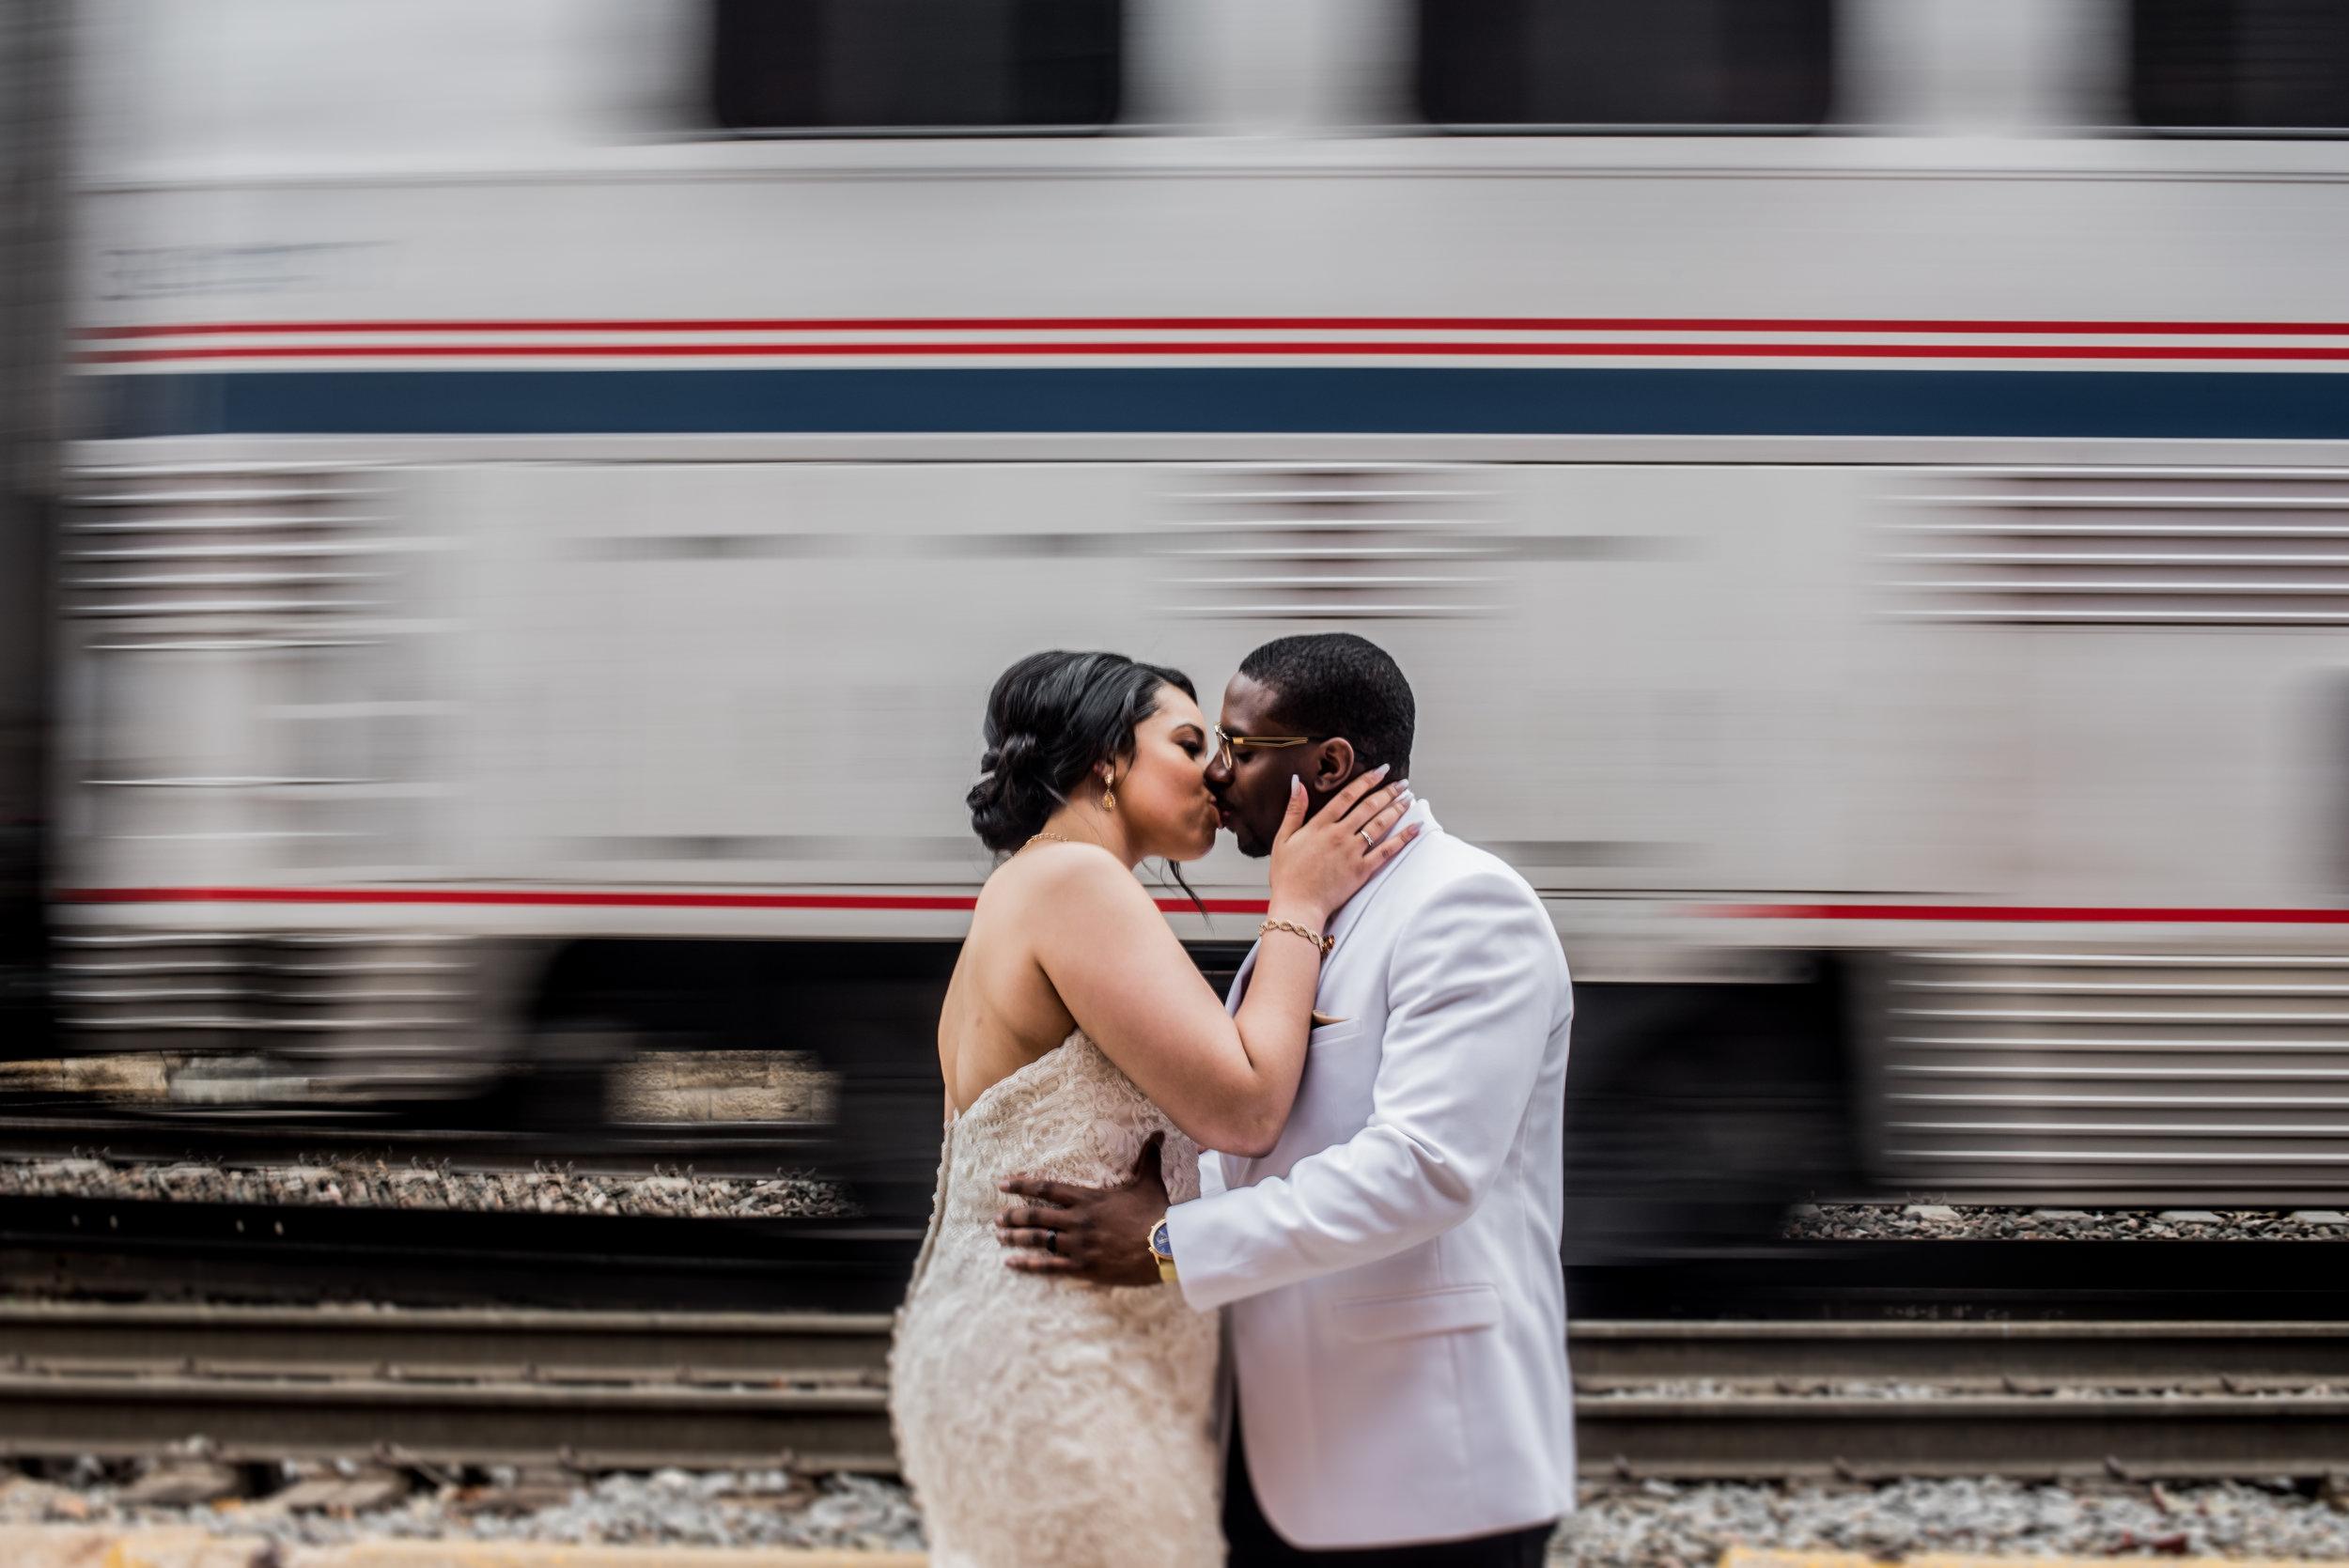 Burlington Iowa Wedding Midwest Photographer Melissa Cervantes _ Chantelle and Isaiah 555e.jpg